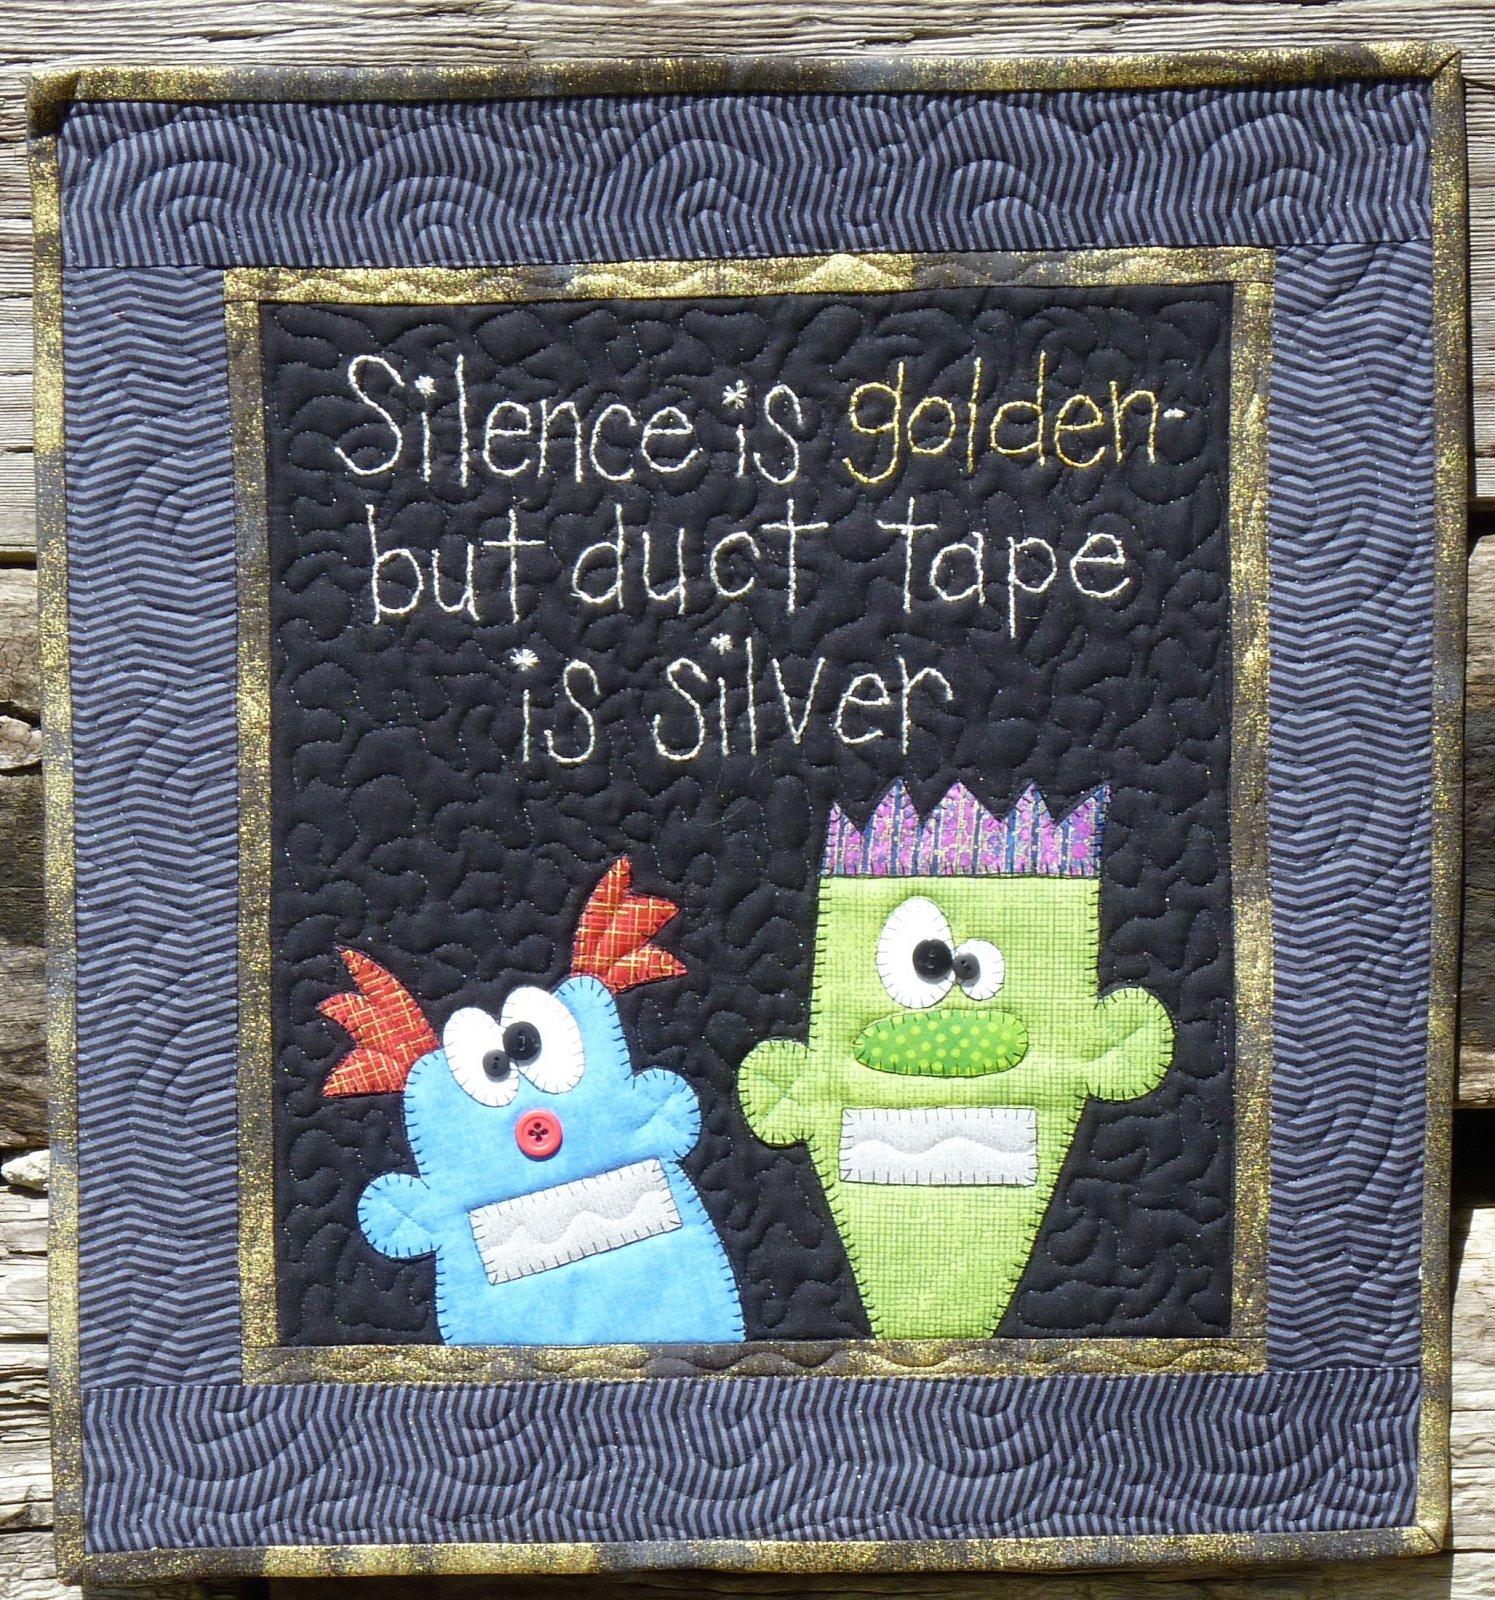 662 Silence is Golden